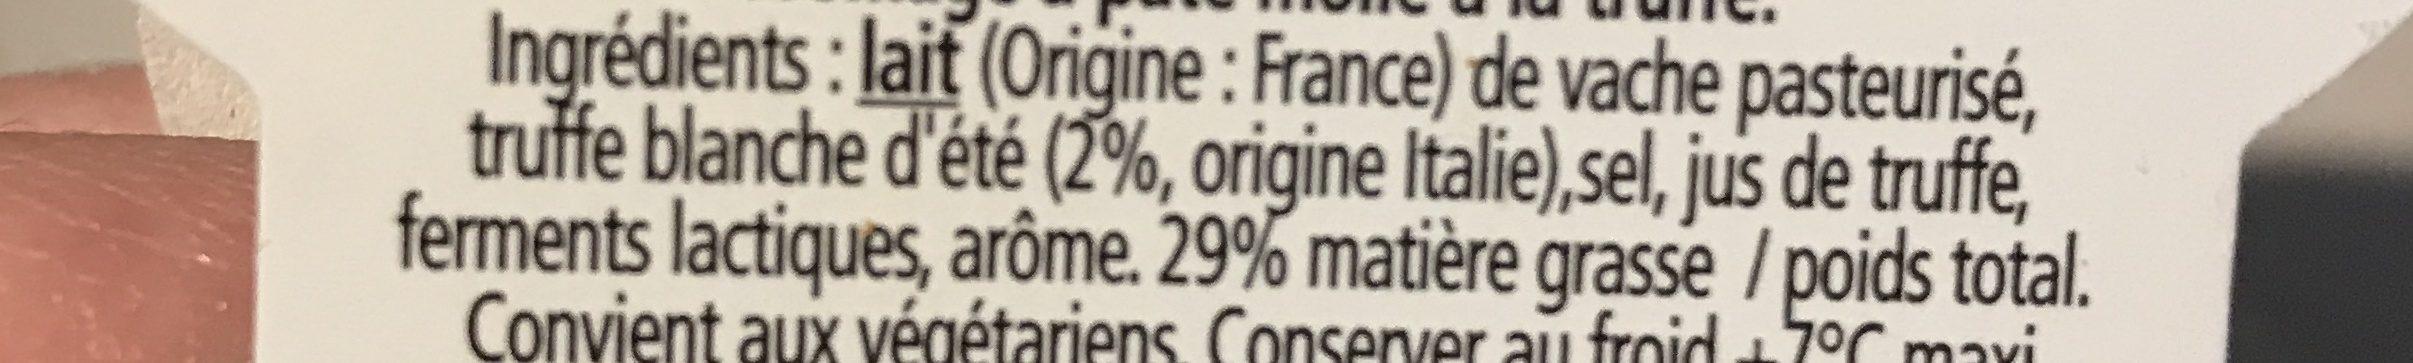 L'Ortolan Truffe 29% M.G. - Ingrédients - fr